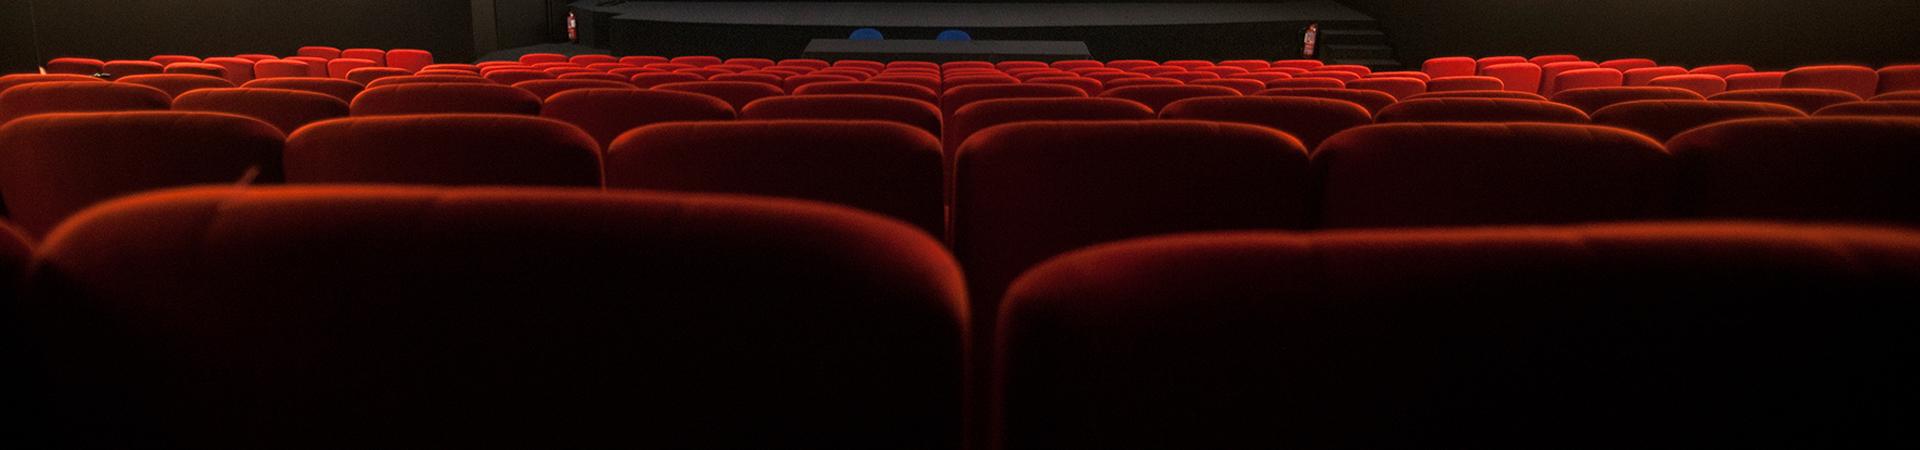 Festival-de-Cinema-Europeen-des-Arcs-2016_c_Pidz.jpg